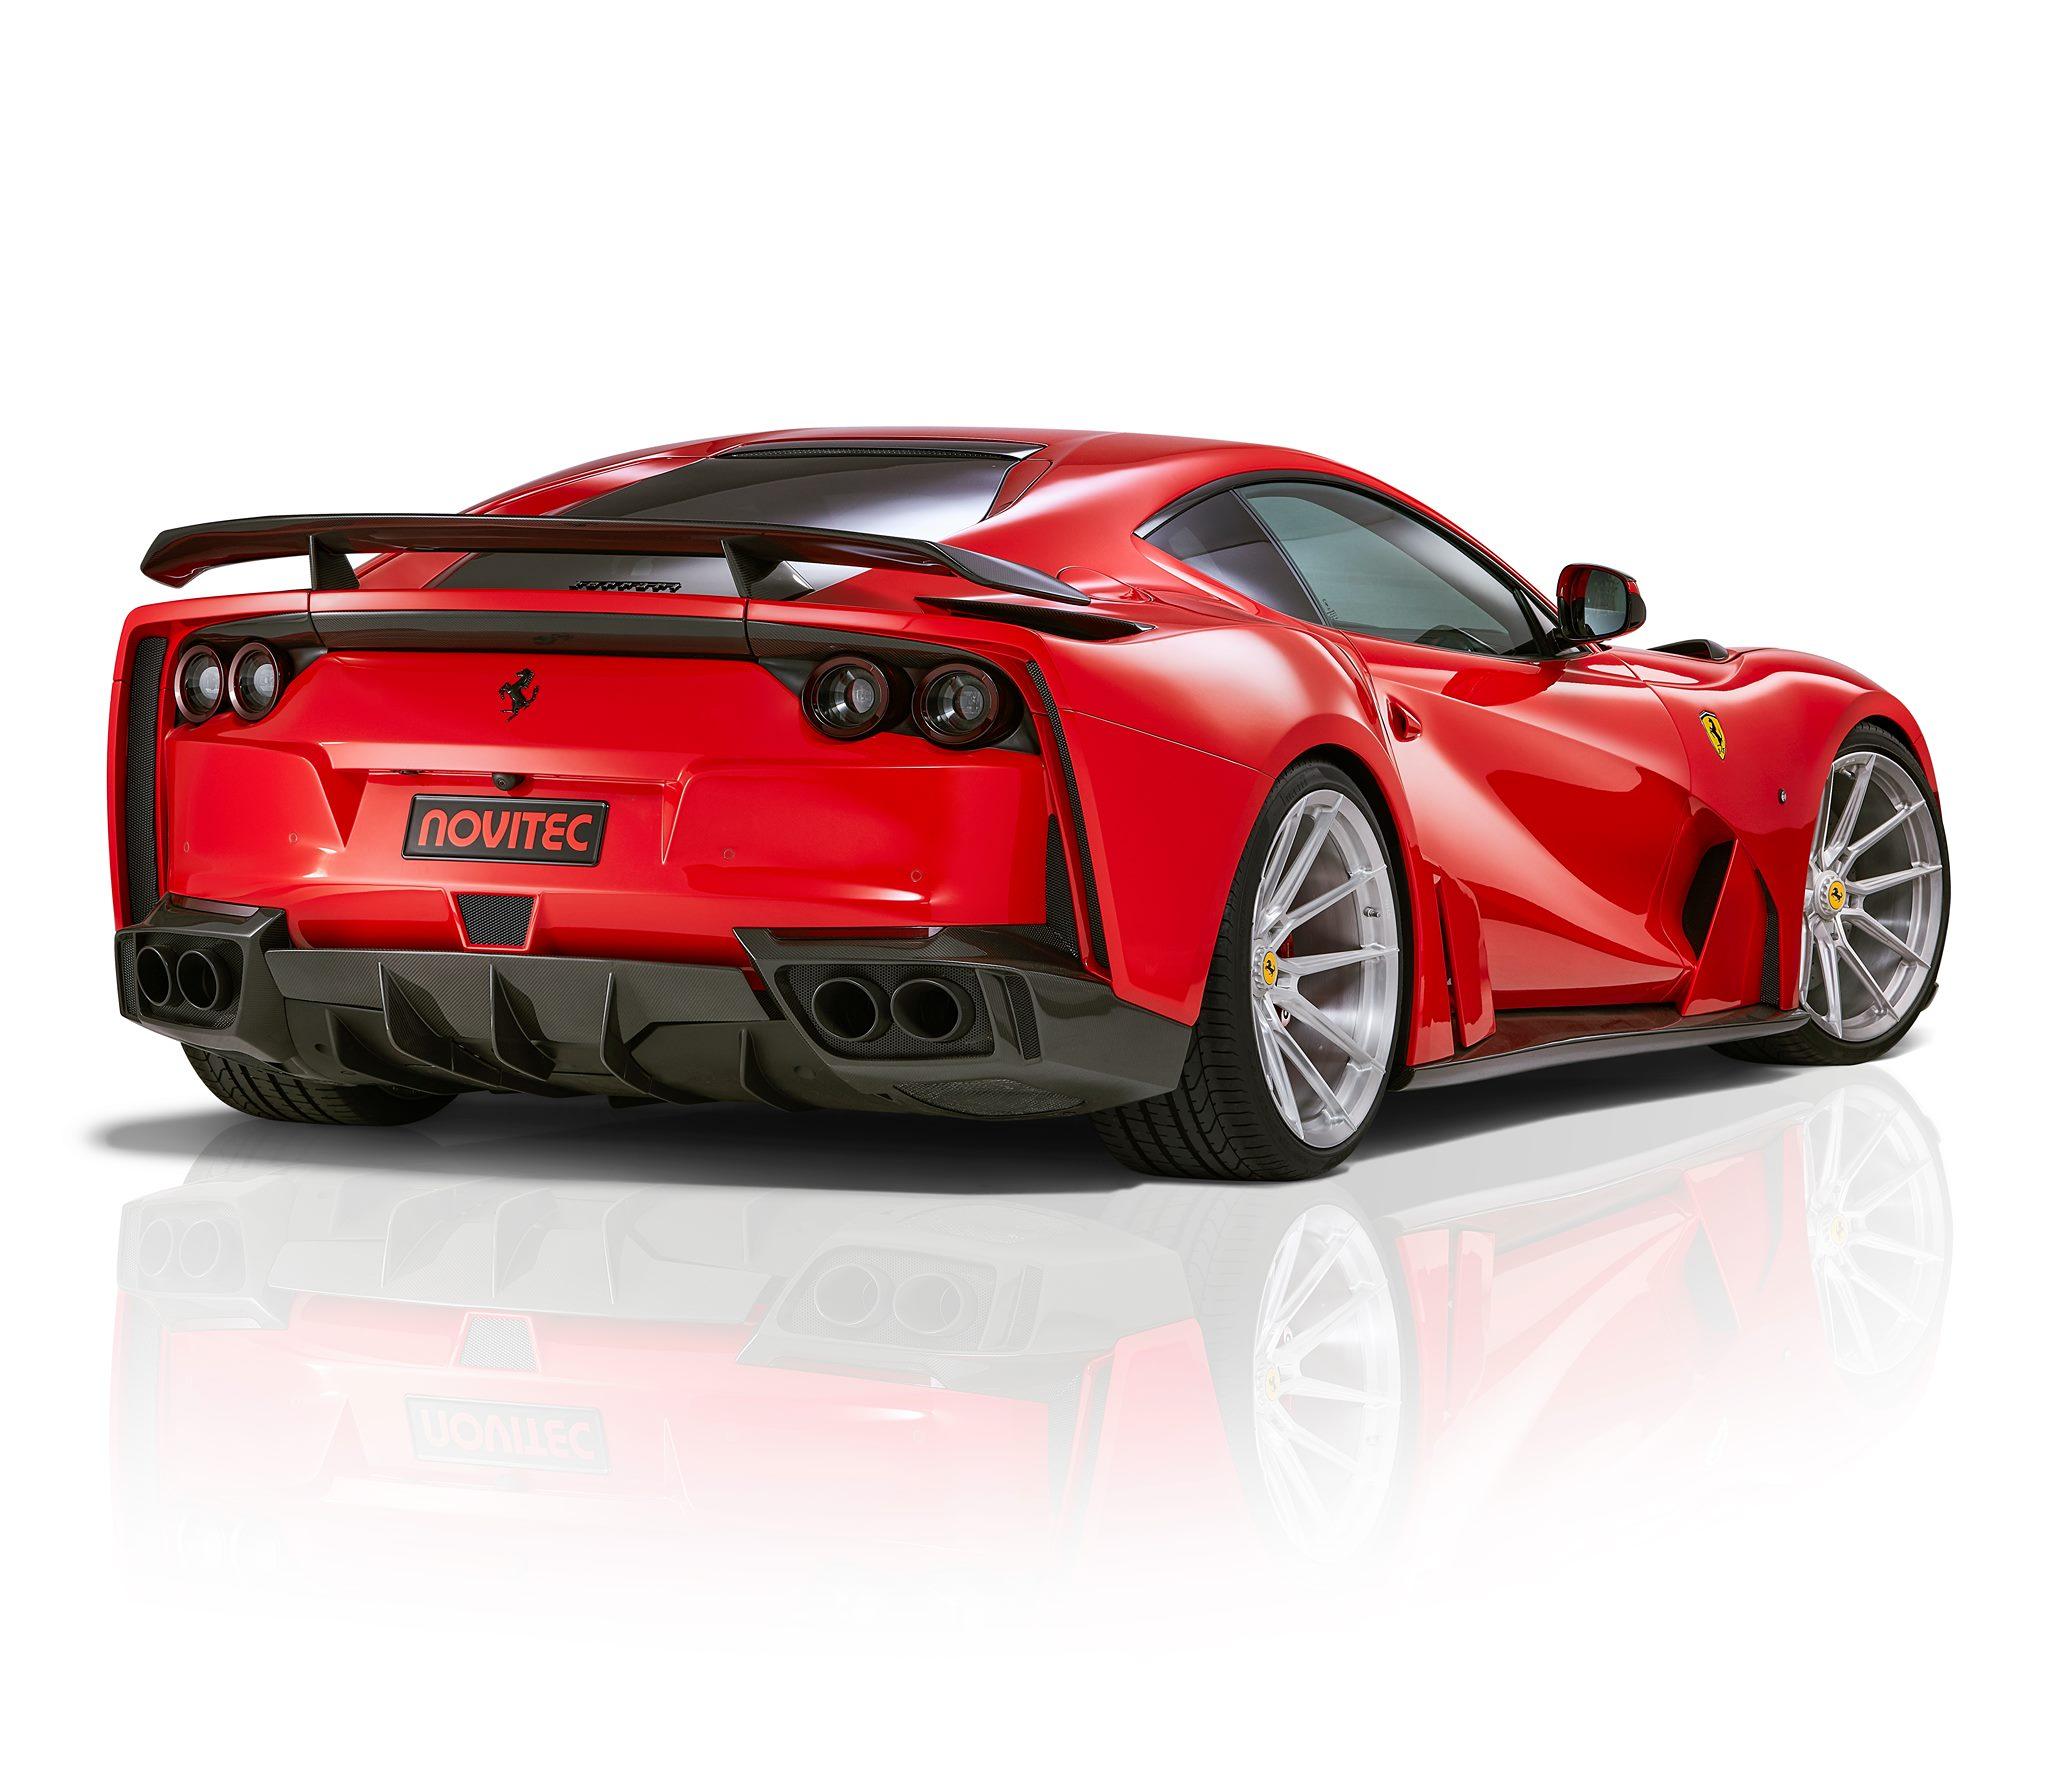 Ferrari-812-Superfast-N-Largo-by-Novitec-24